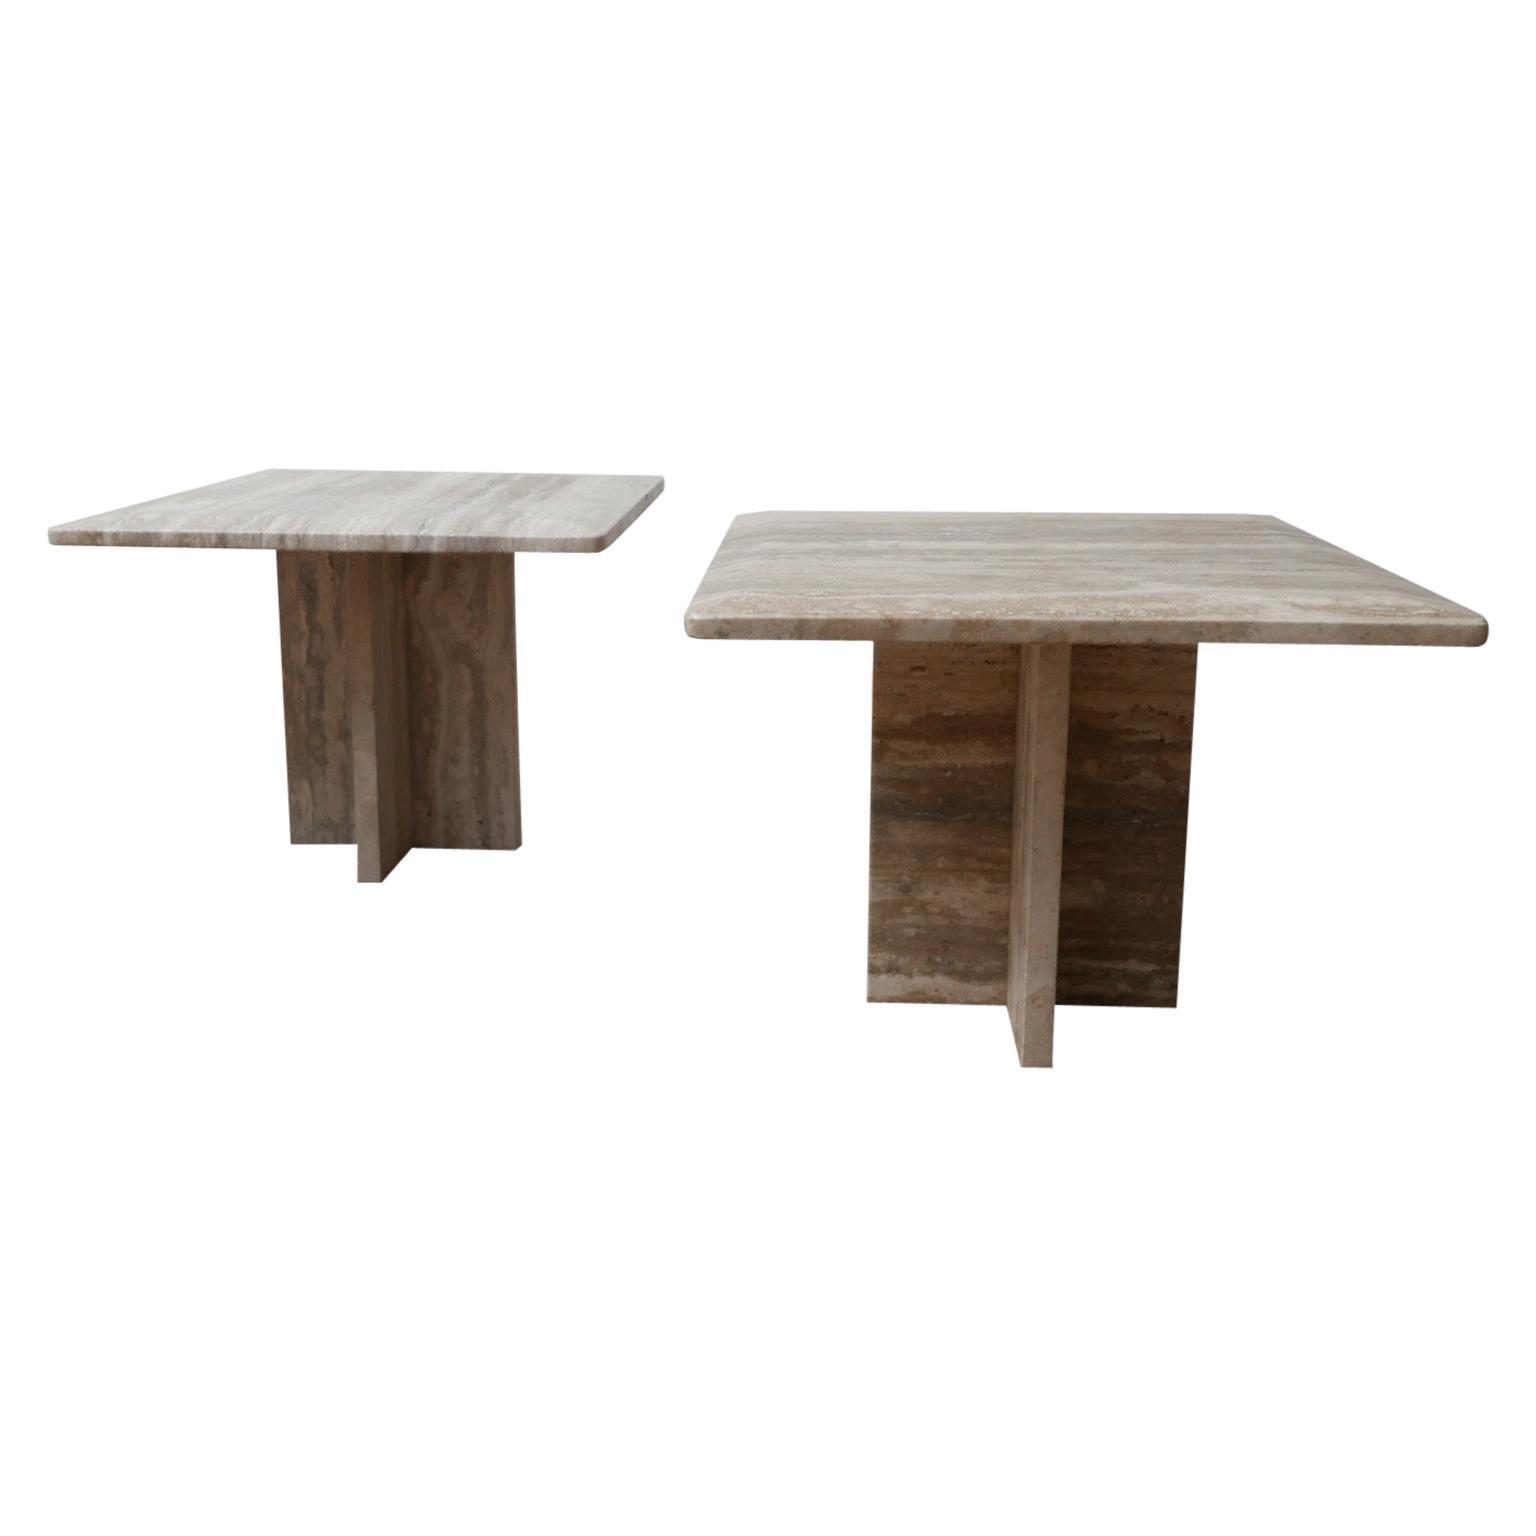 Pair of Travertine Midcentury Side Tables